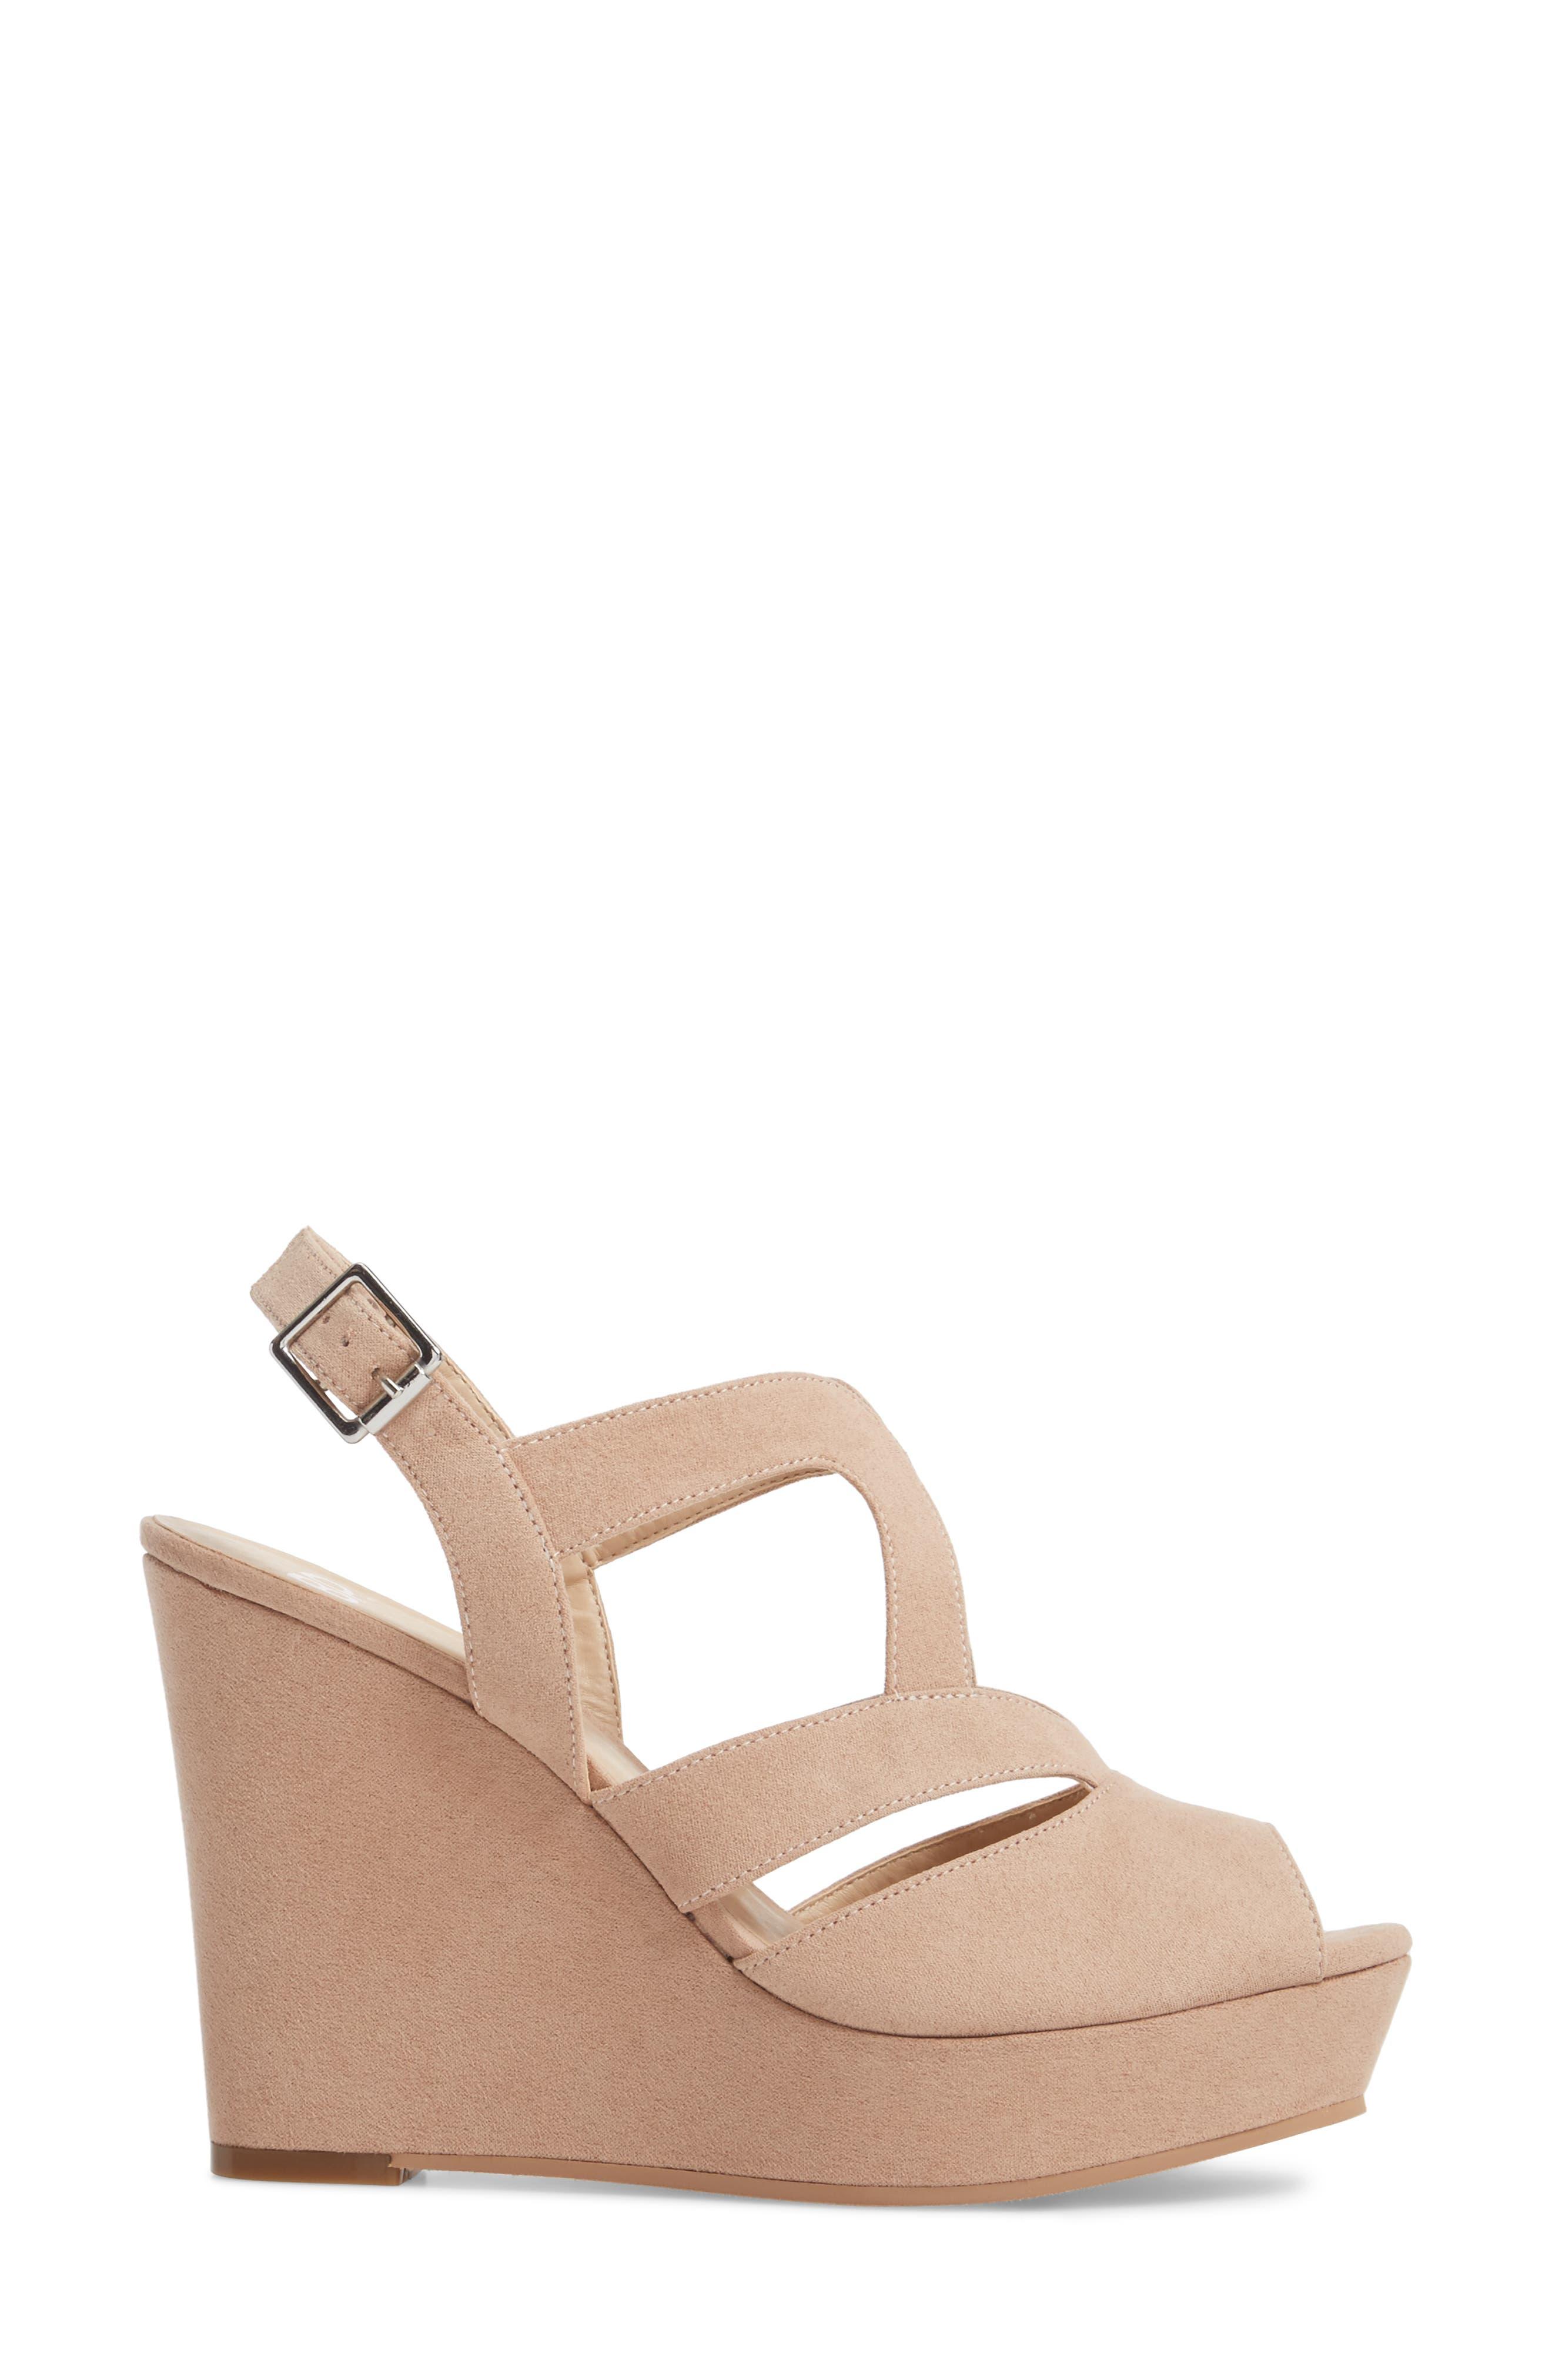 Sunny Platform Wedge Sandal,                             Alternate thumbnail 17, color,